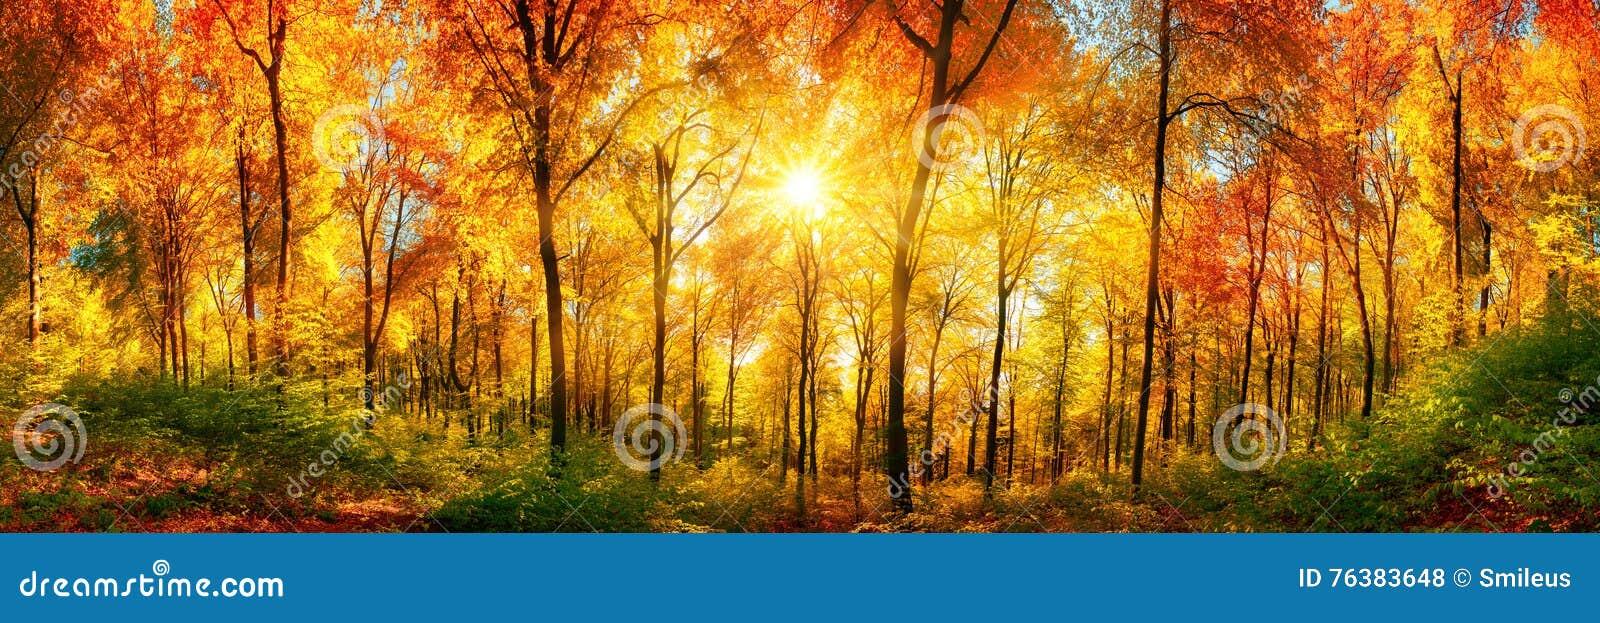 Panorama de forêt en automne